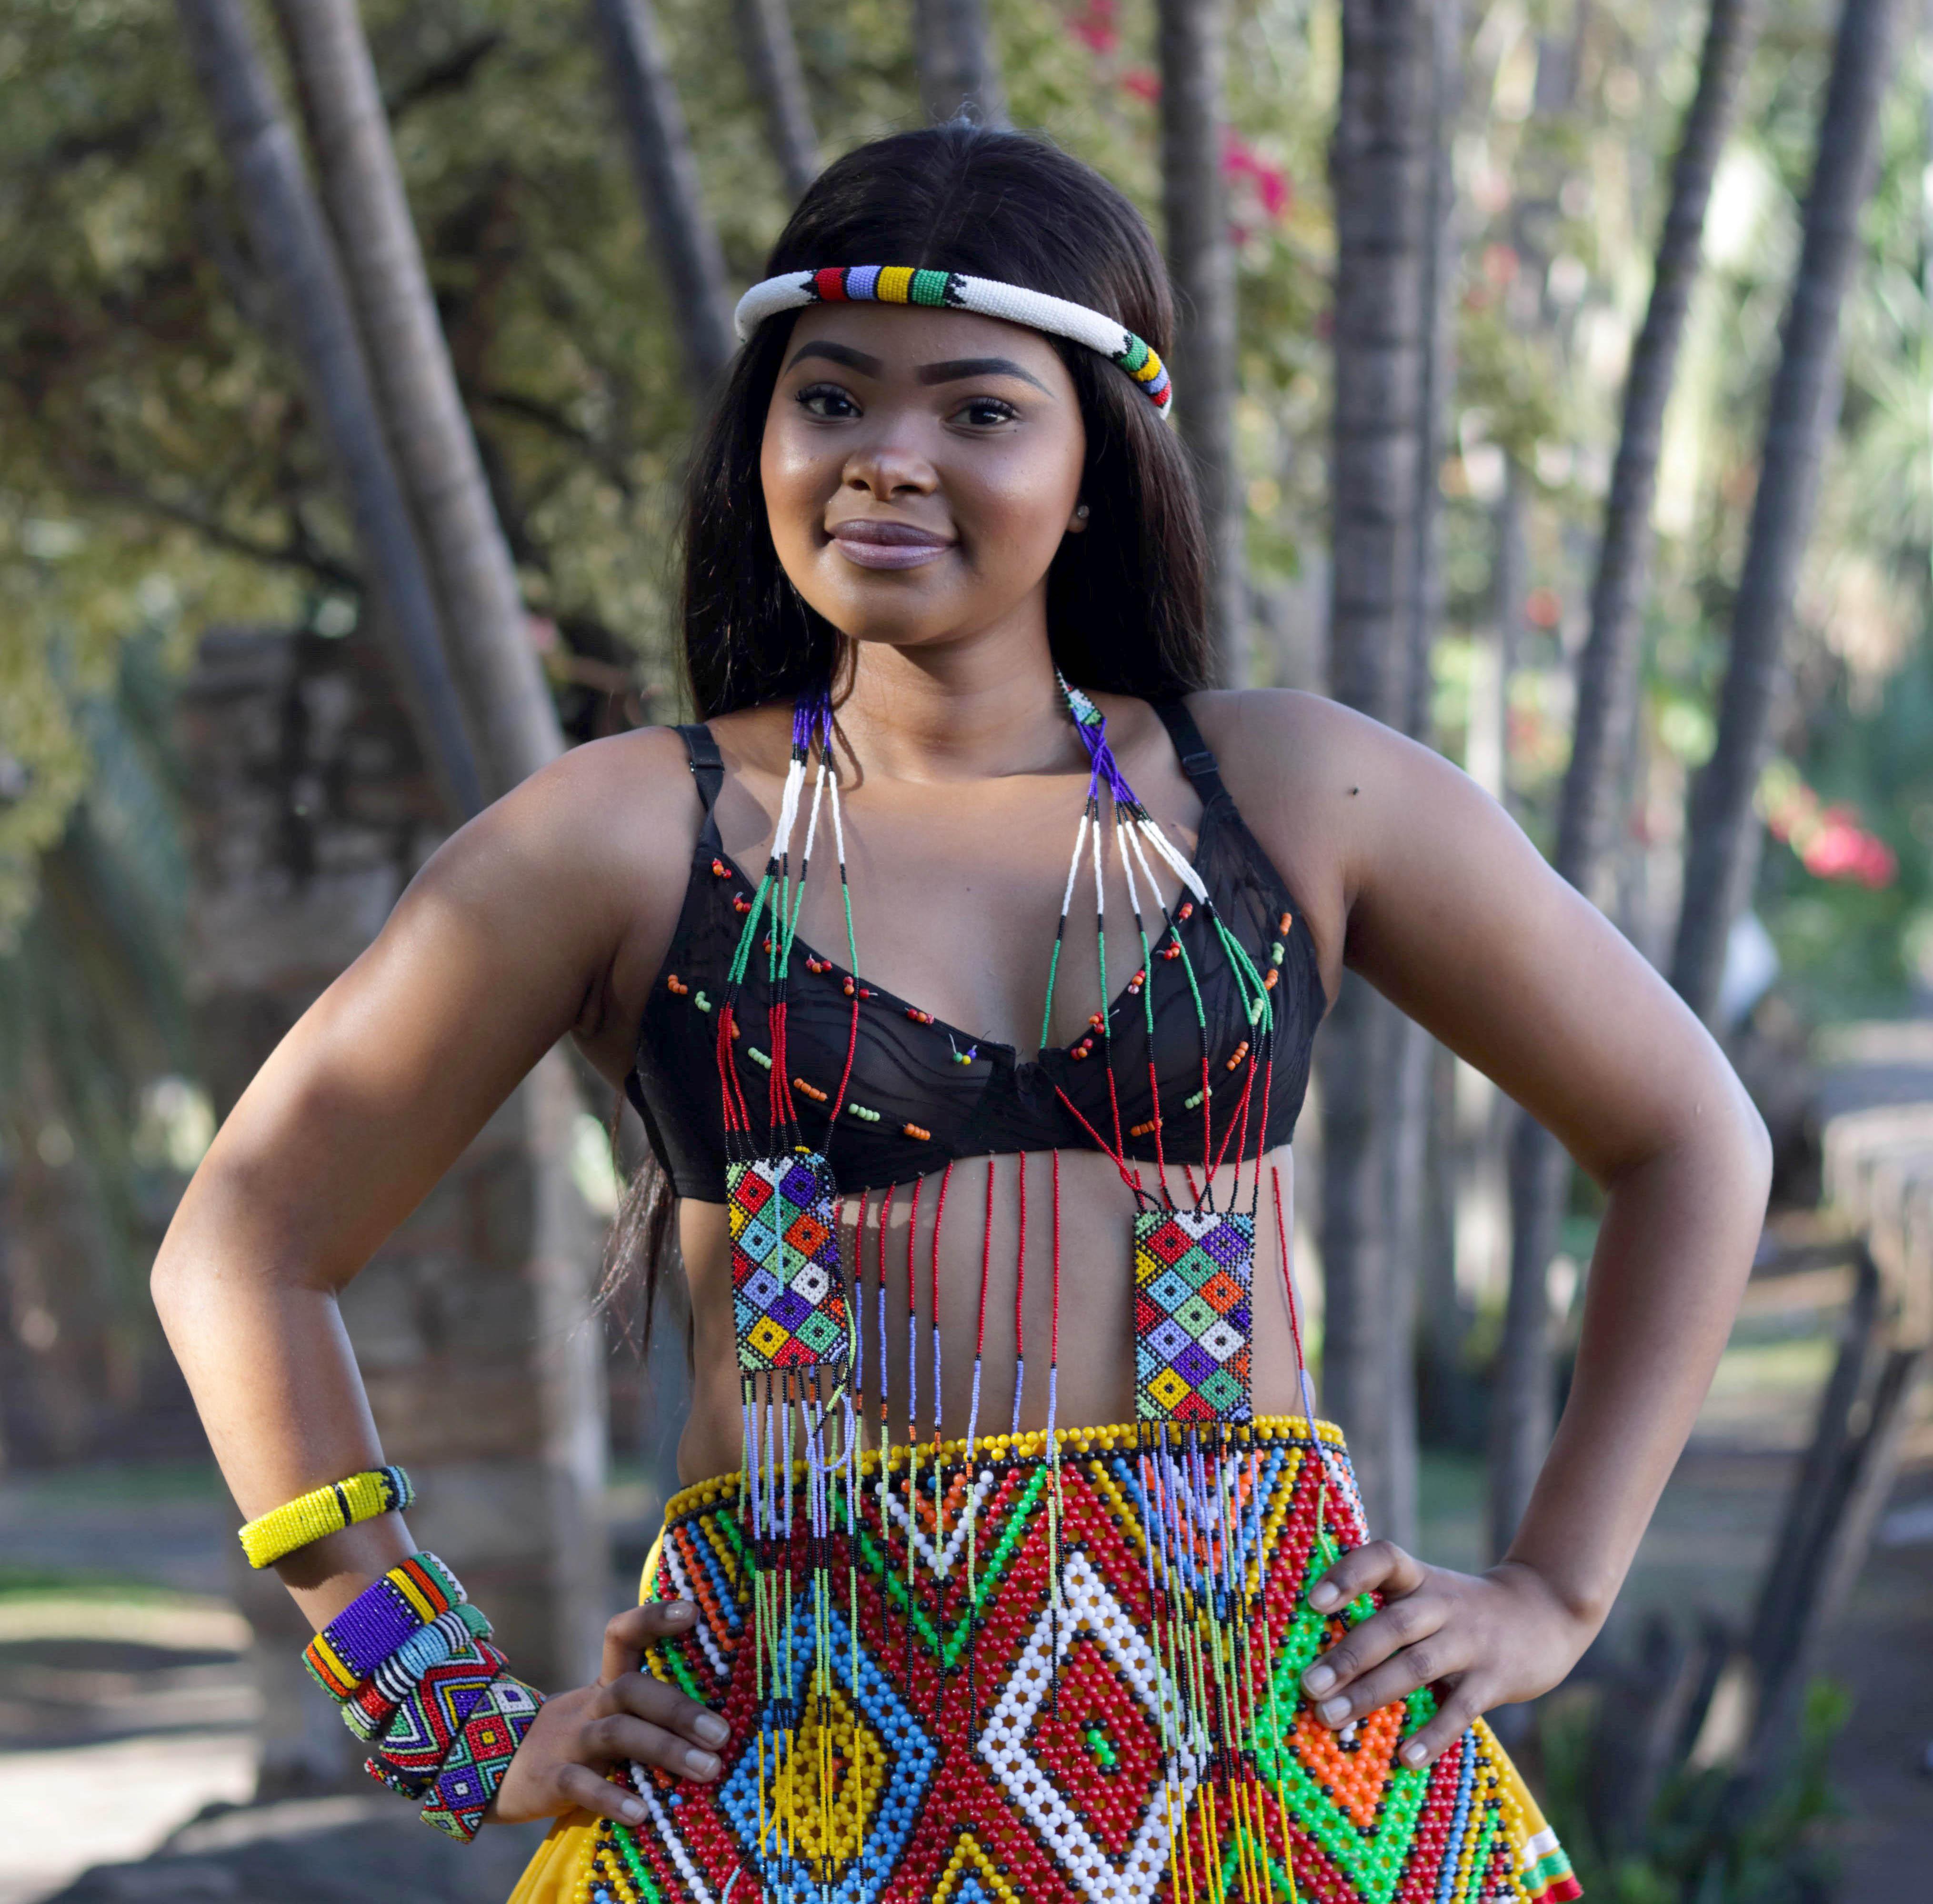 Woman Wearing Beaded Dress Looking at Camera